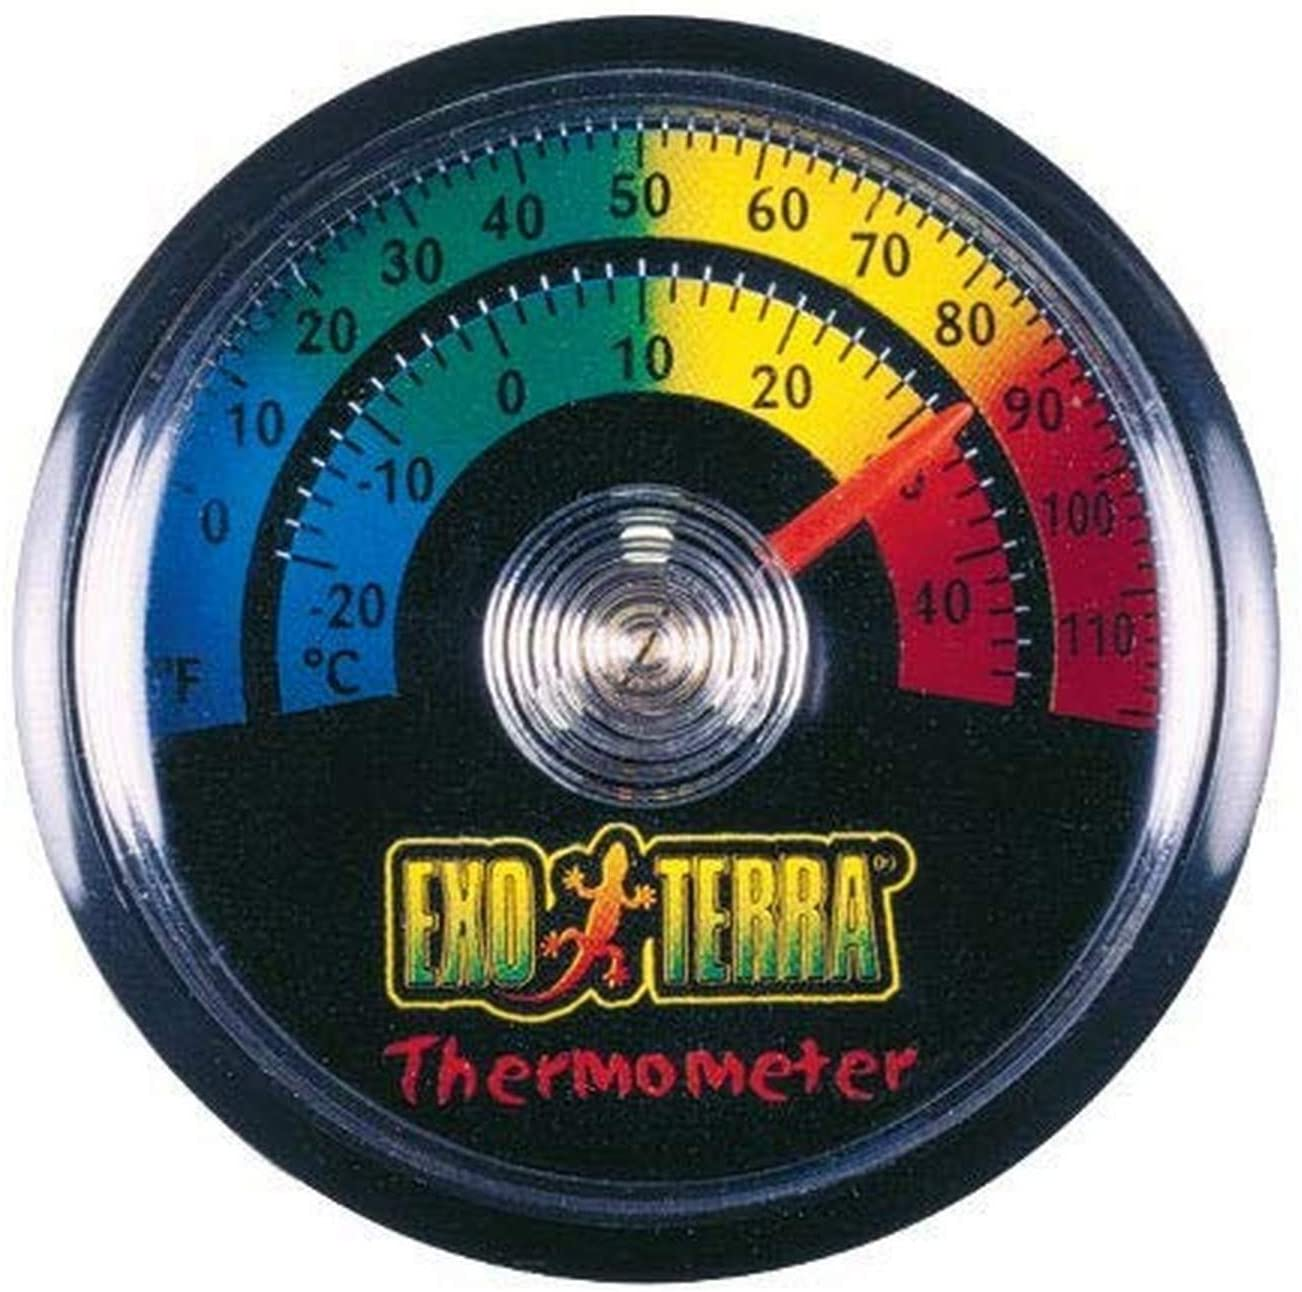 Amazon.com : Exo Terra Thermometer, Celsius and Fahrenheit ...